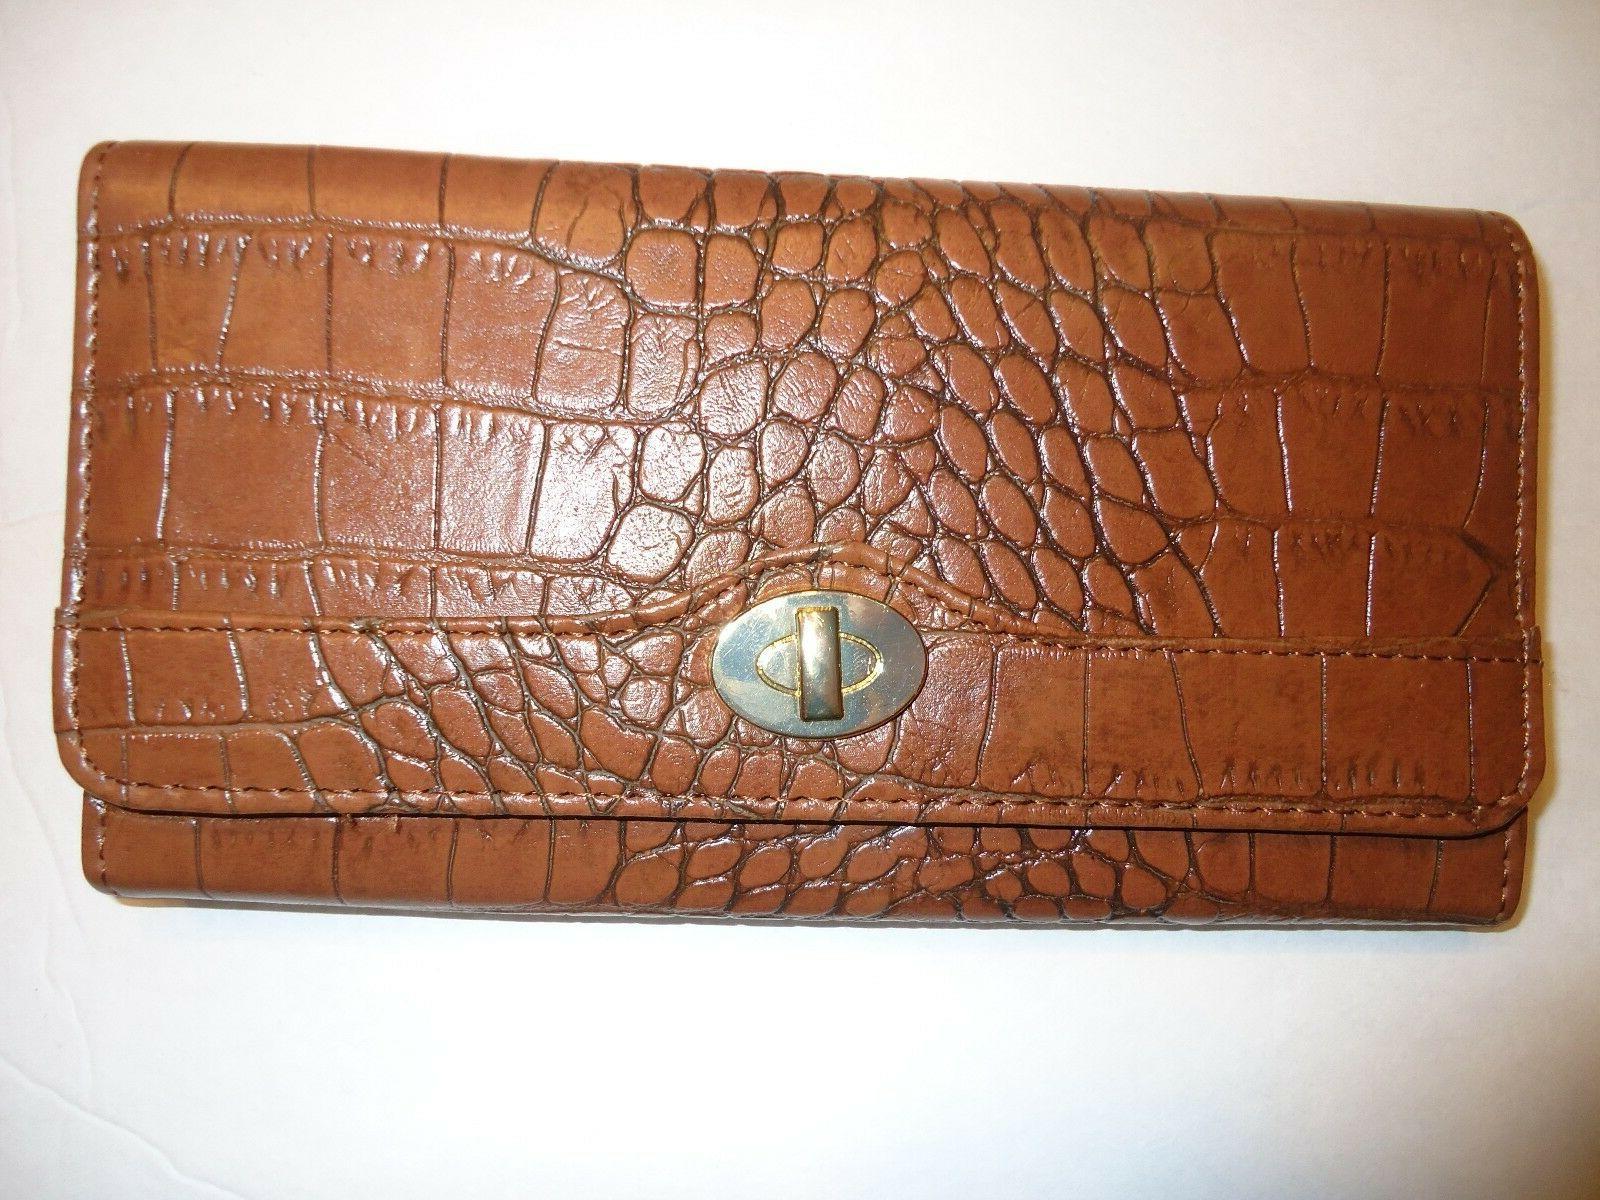 ladies coupon clutch wallet luggage tan